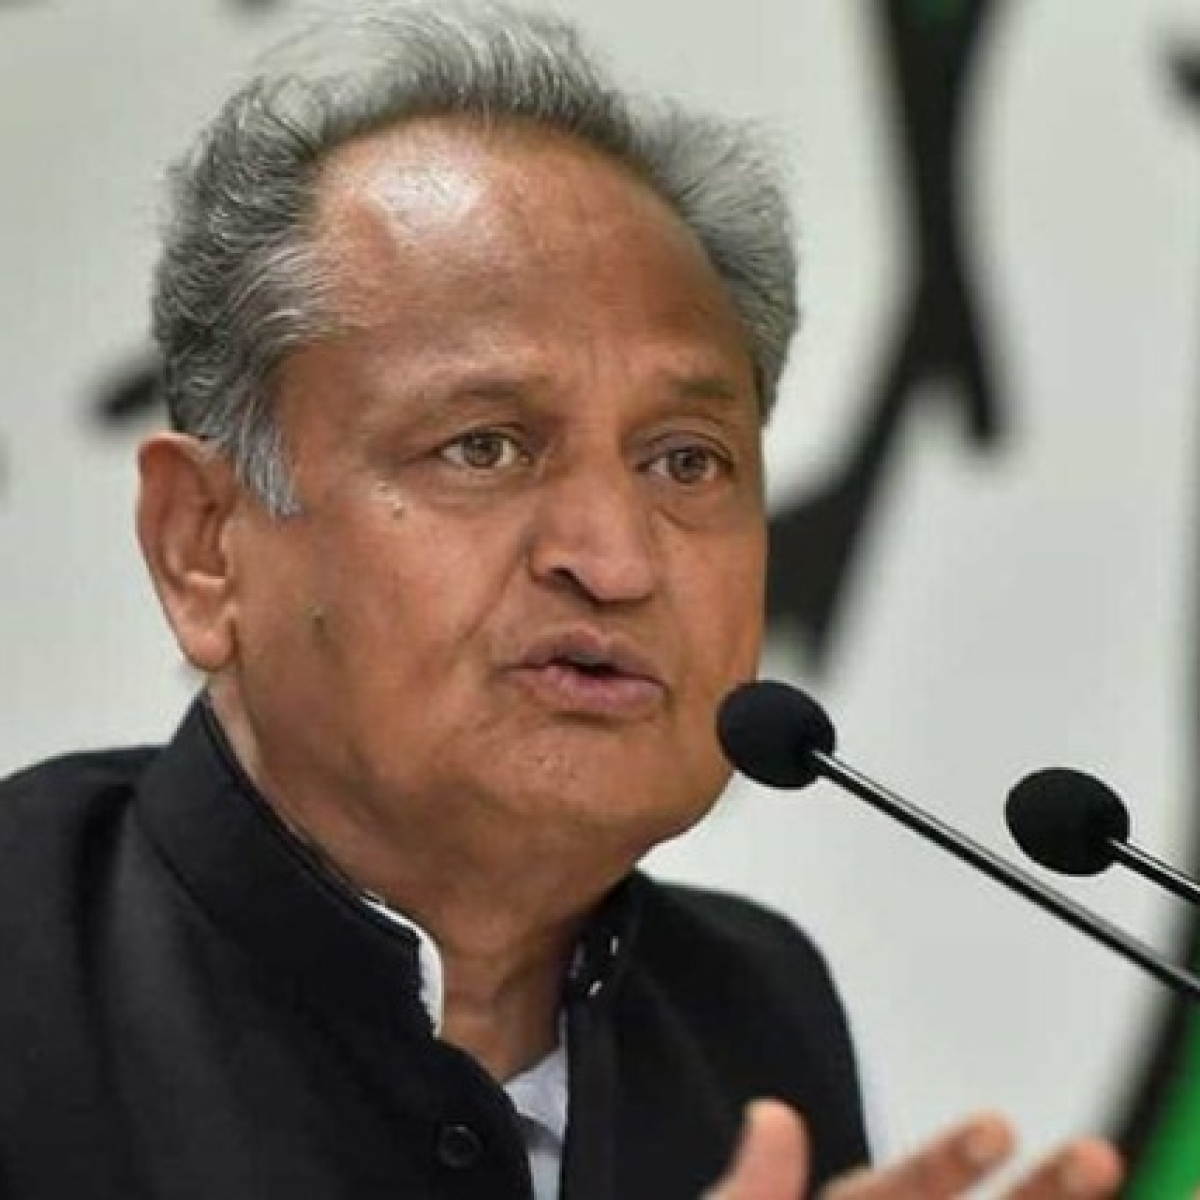 Government to challenge Pehlu Khan lynching verdict, says Rajasthan CM Ashok Gehlot